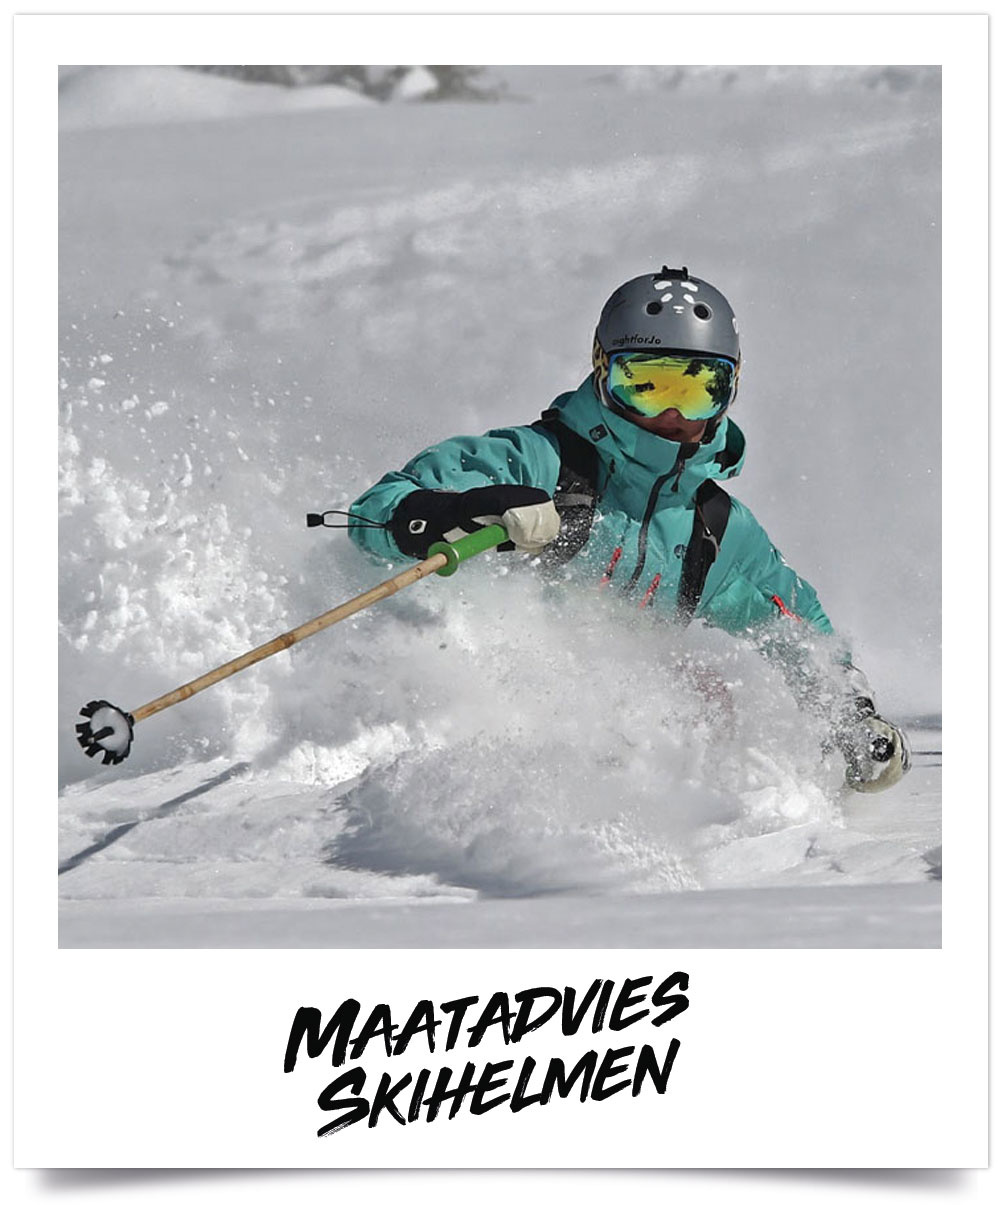 Maattabel Ski en Snowboard helmen